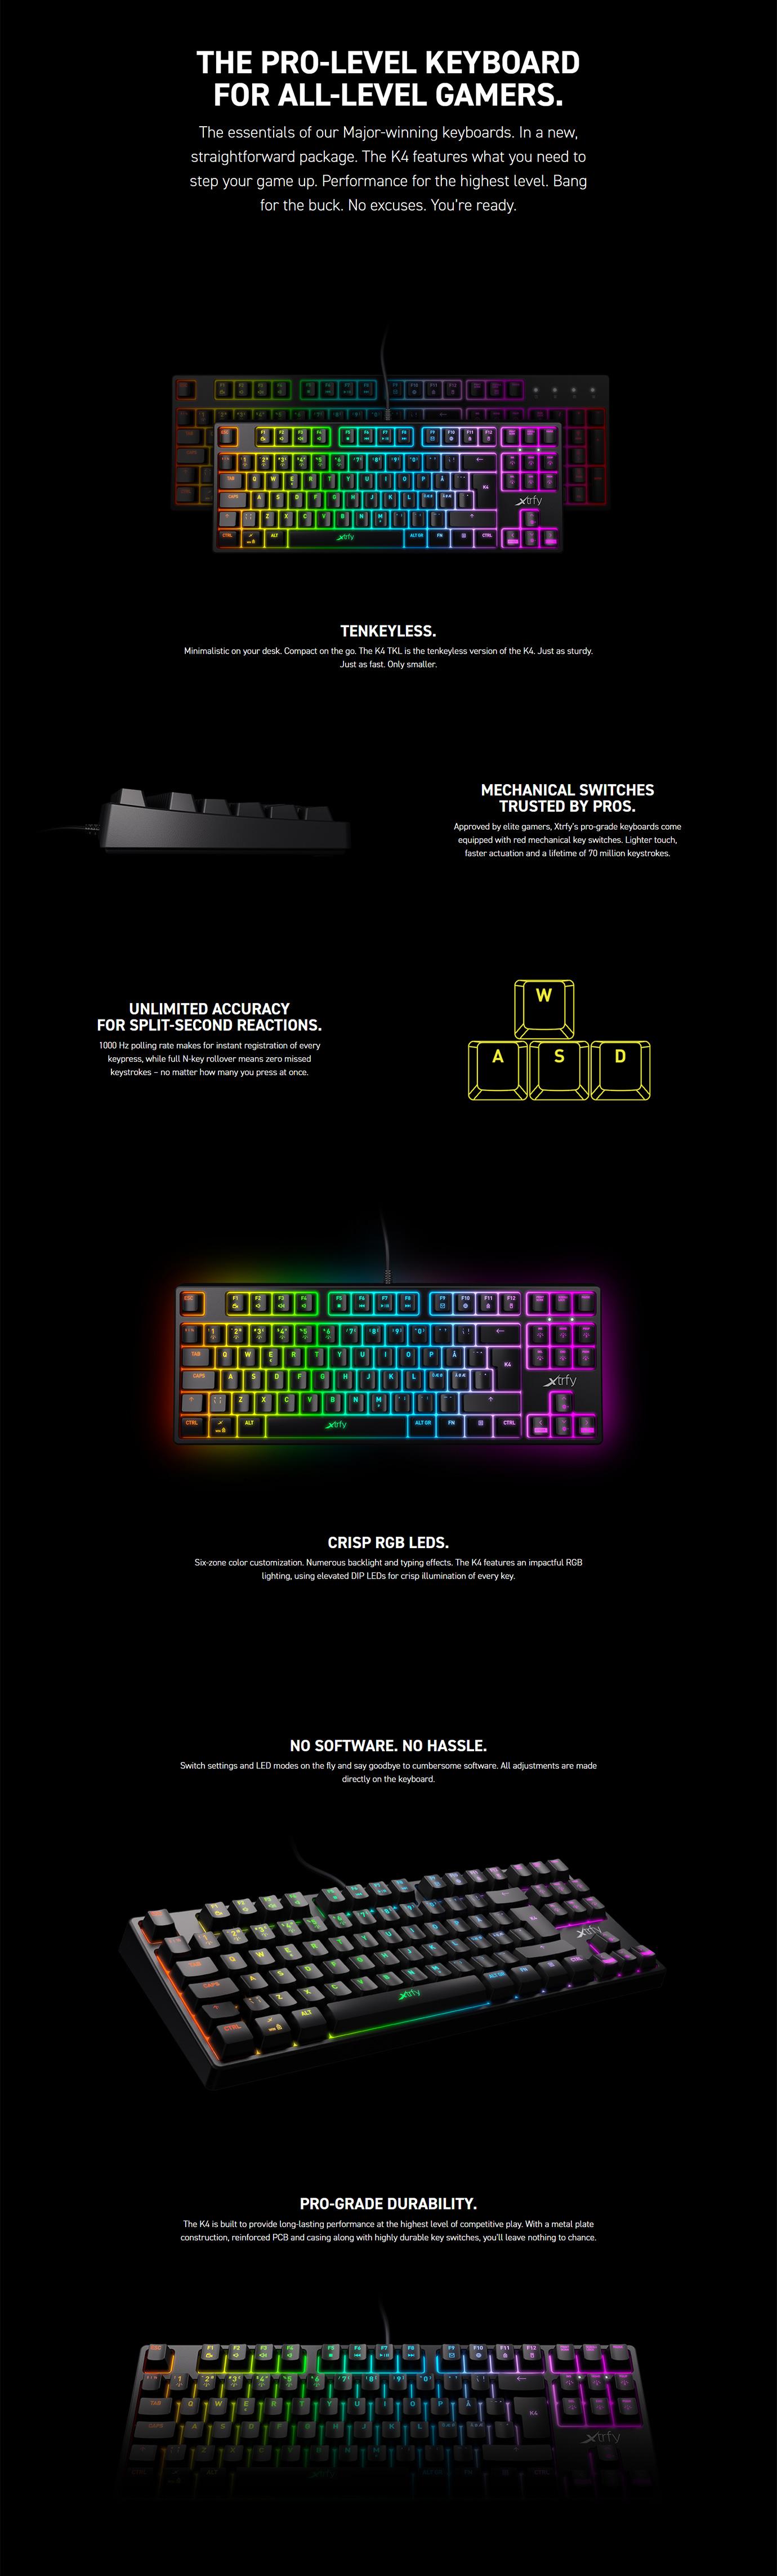 Xtrfy K4 RGB TKL Mechanical Gaming Keyboard